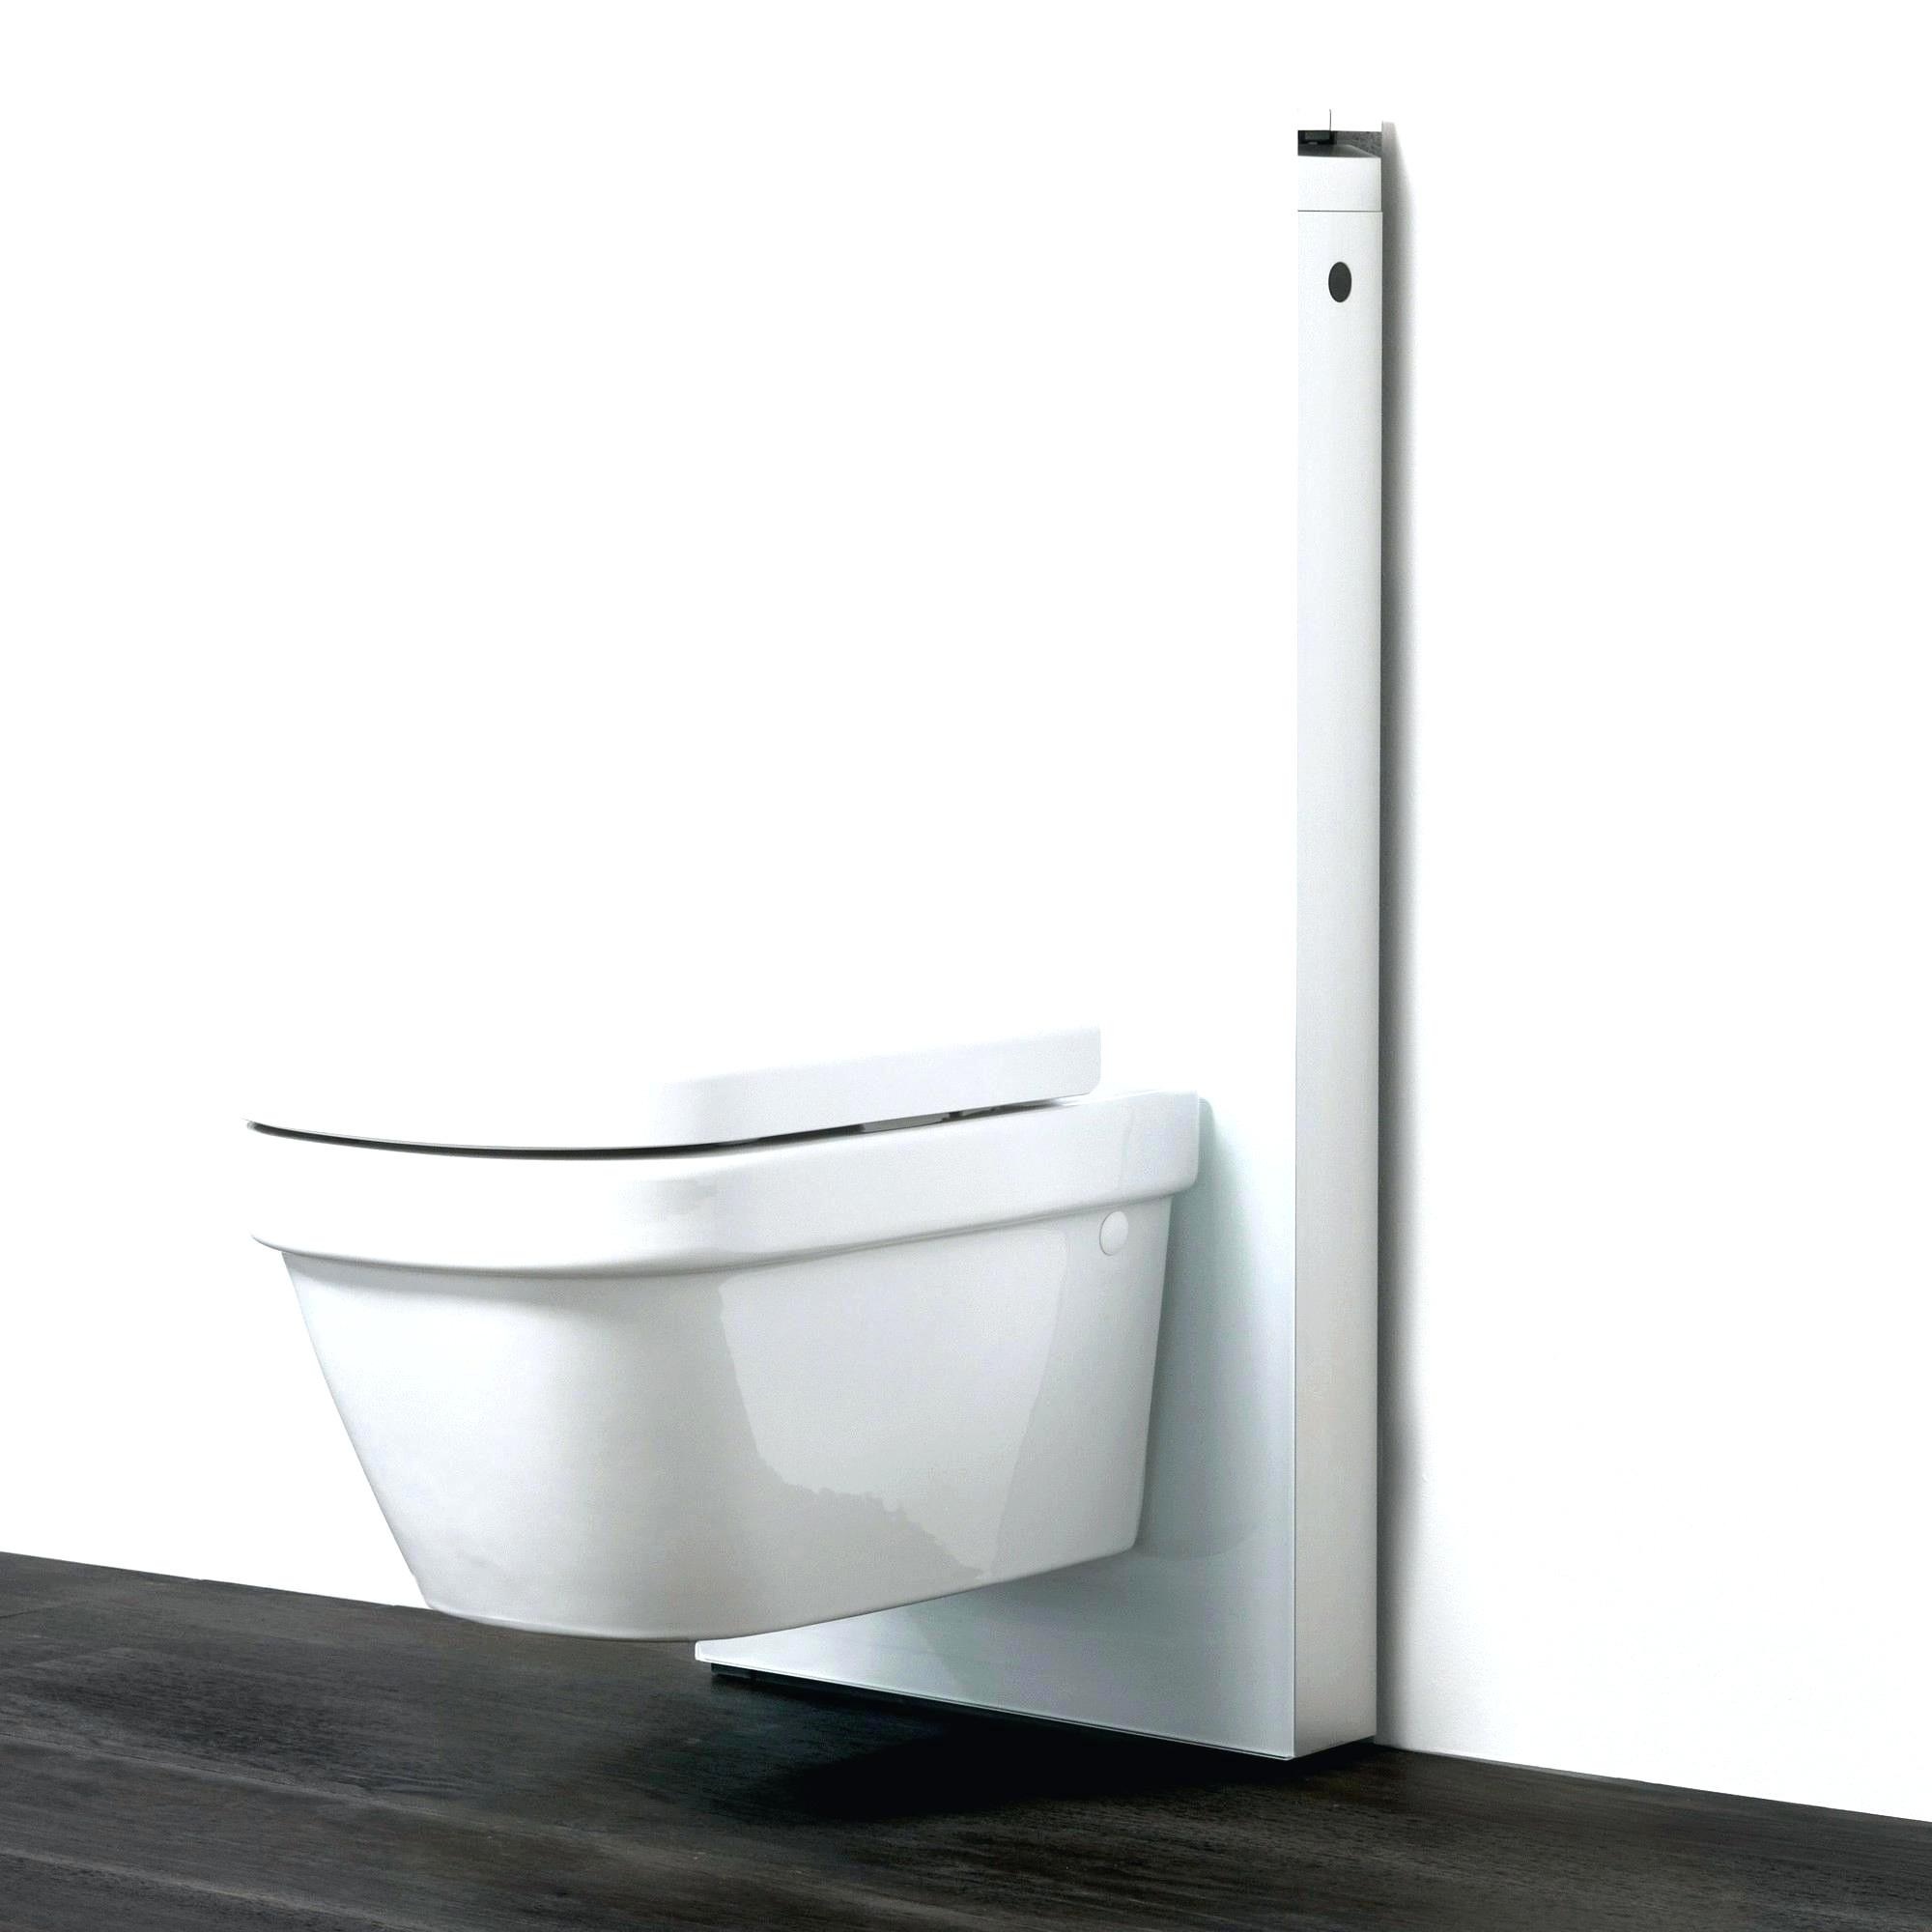 Wc Suspendu Lave Main Lave Main Wc Castorama Toilette Avec concernant Toilette Suspendu Castorama